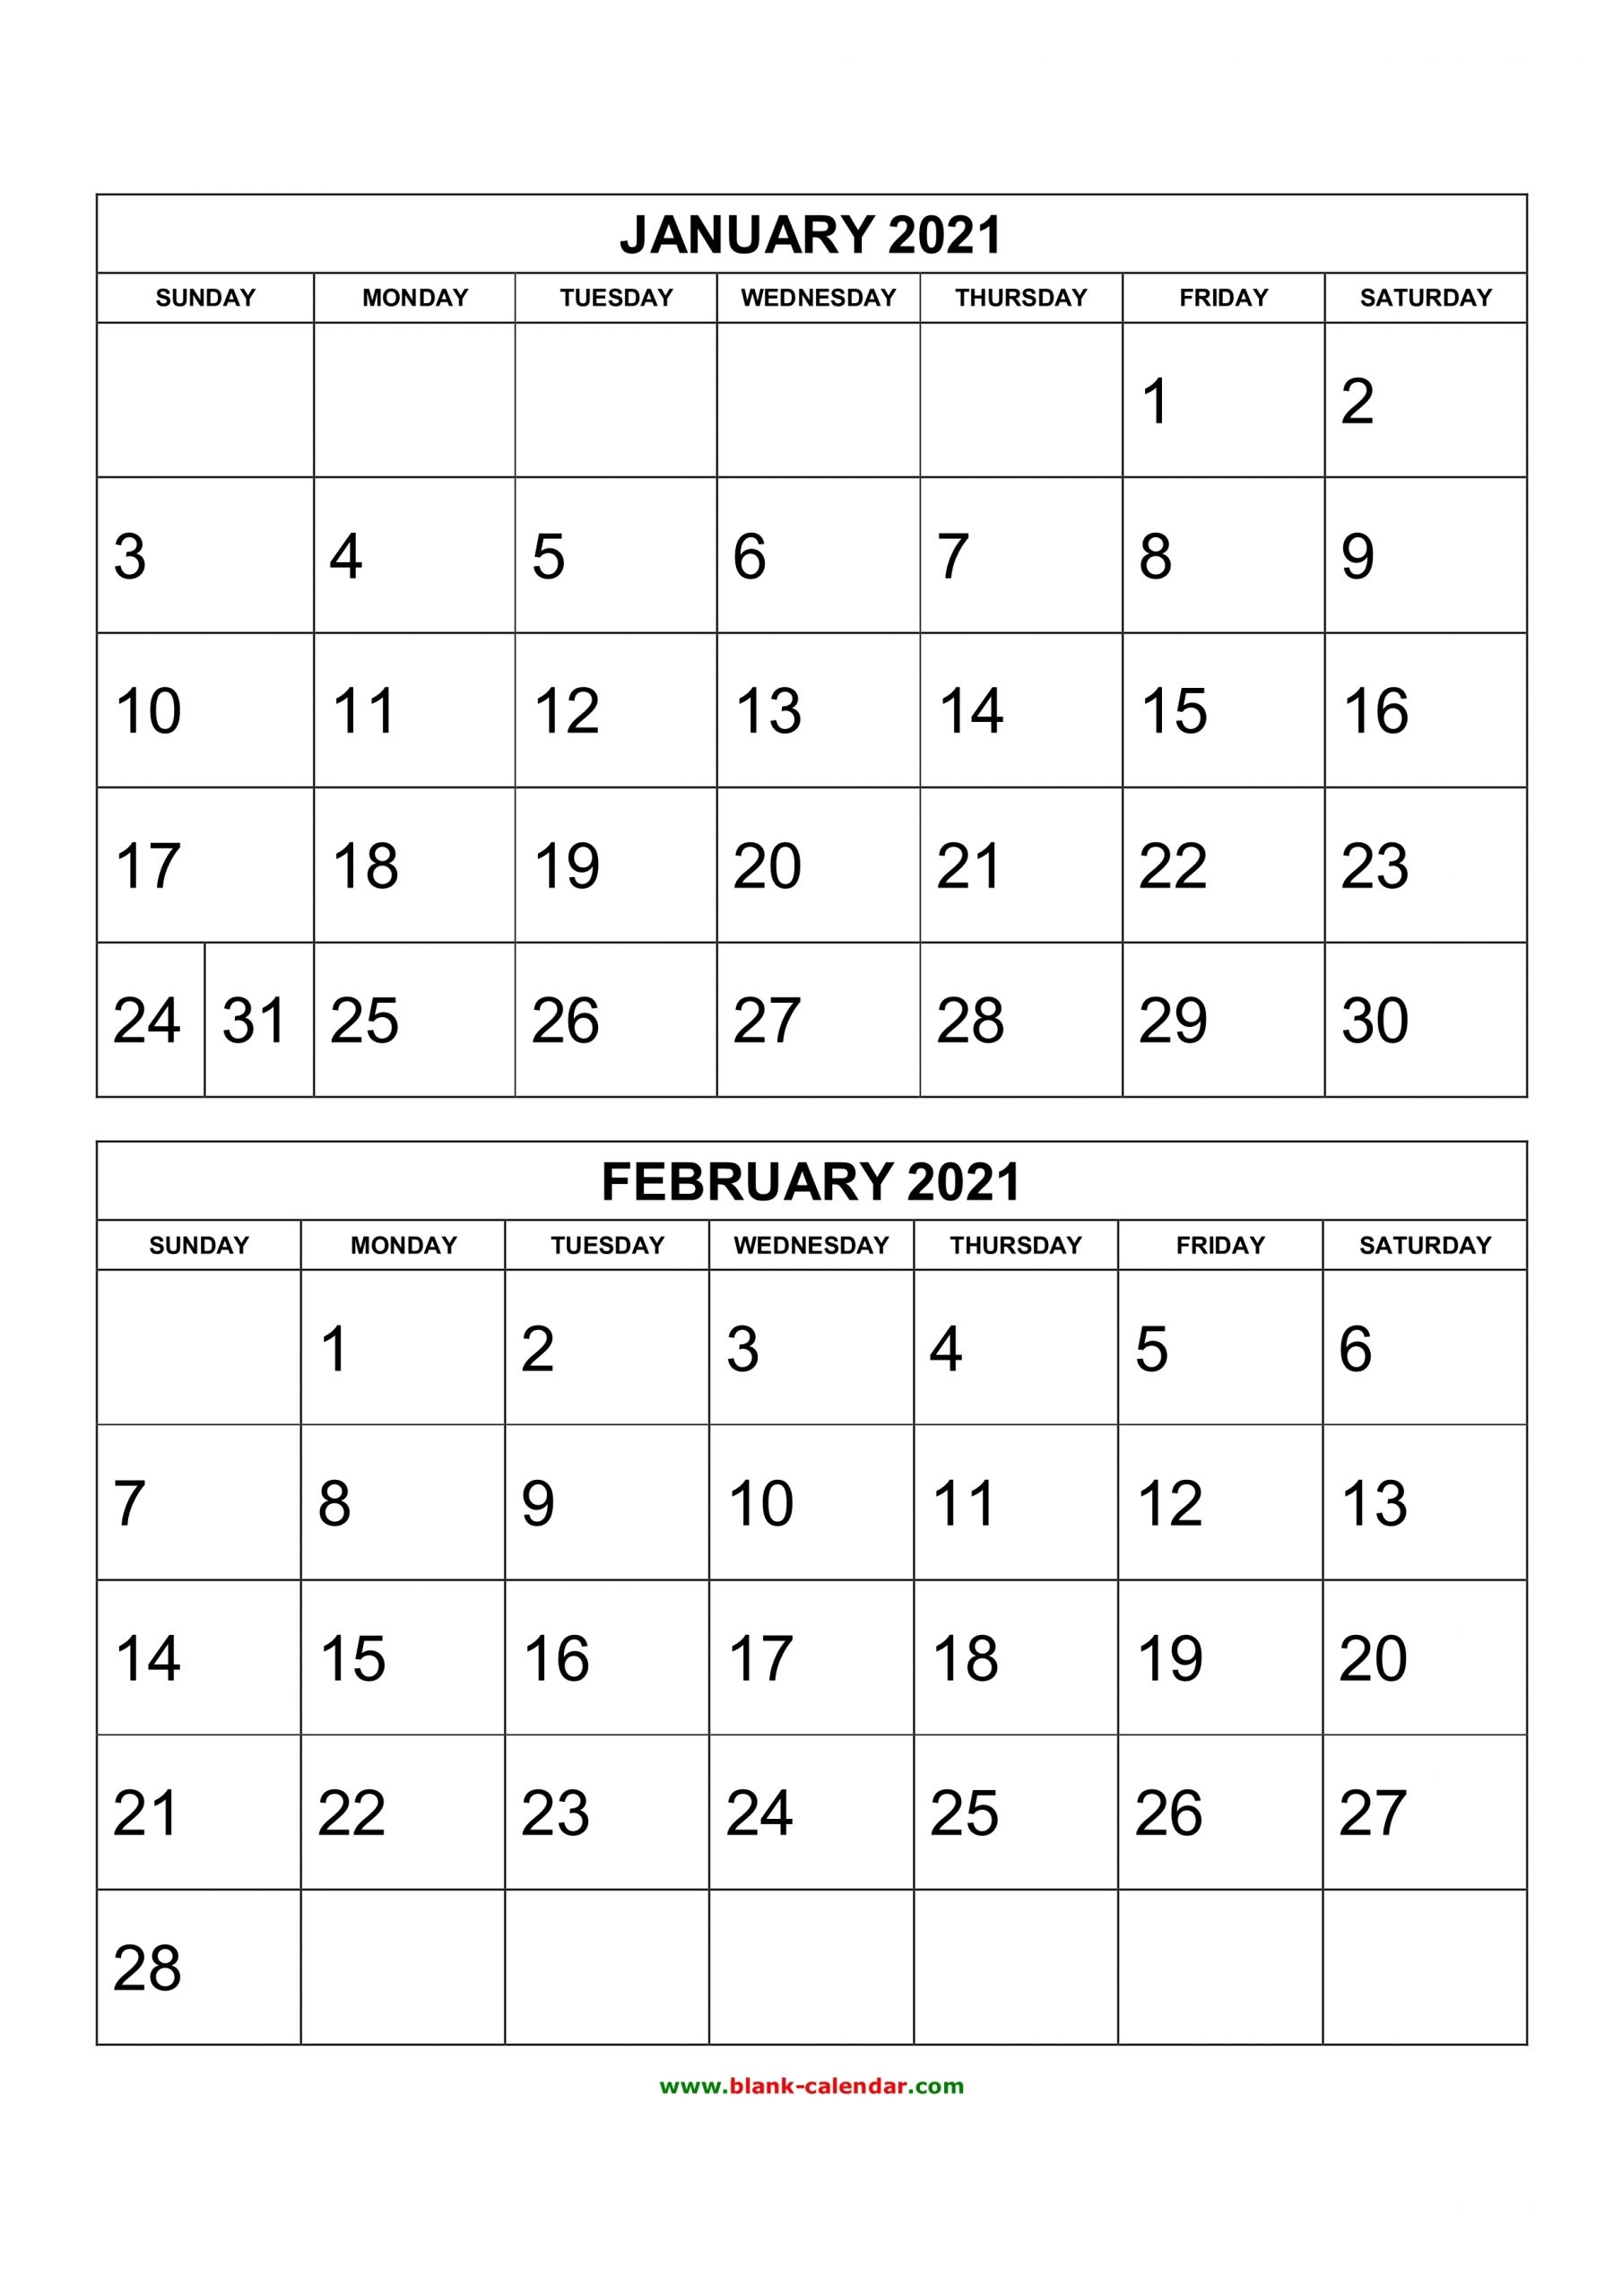 Take 2021 Calendar Month By Month Free Printable